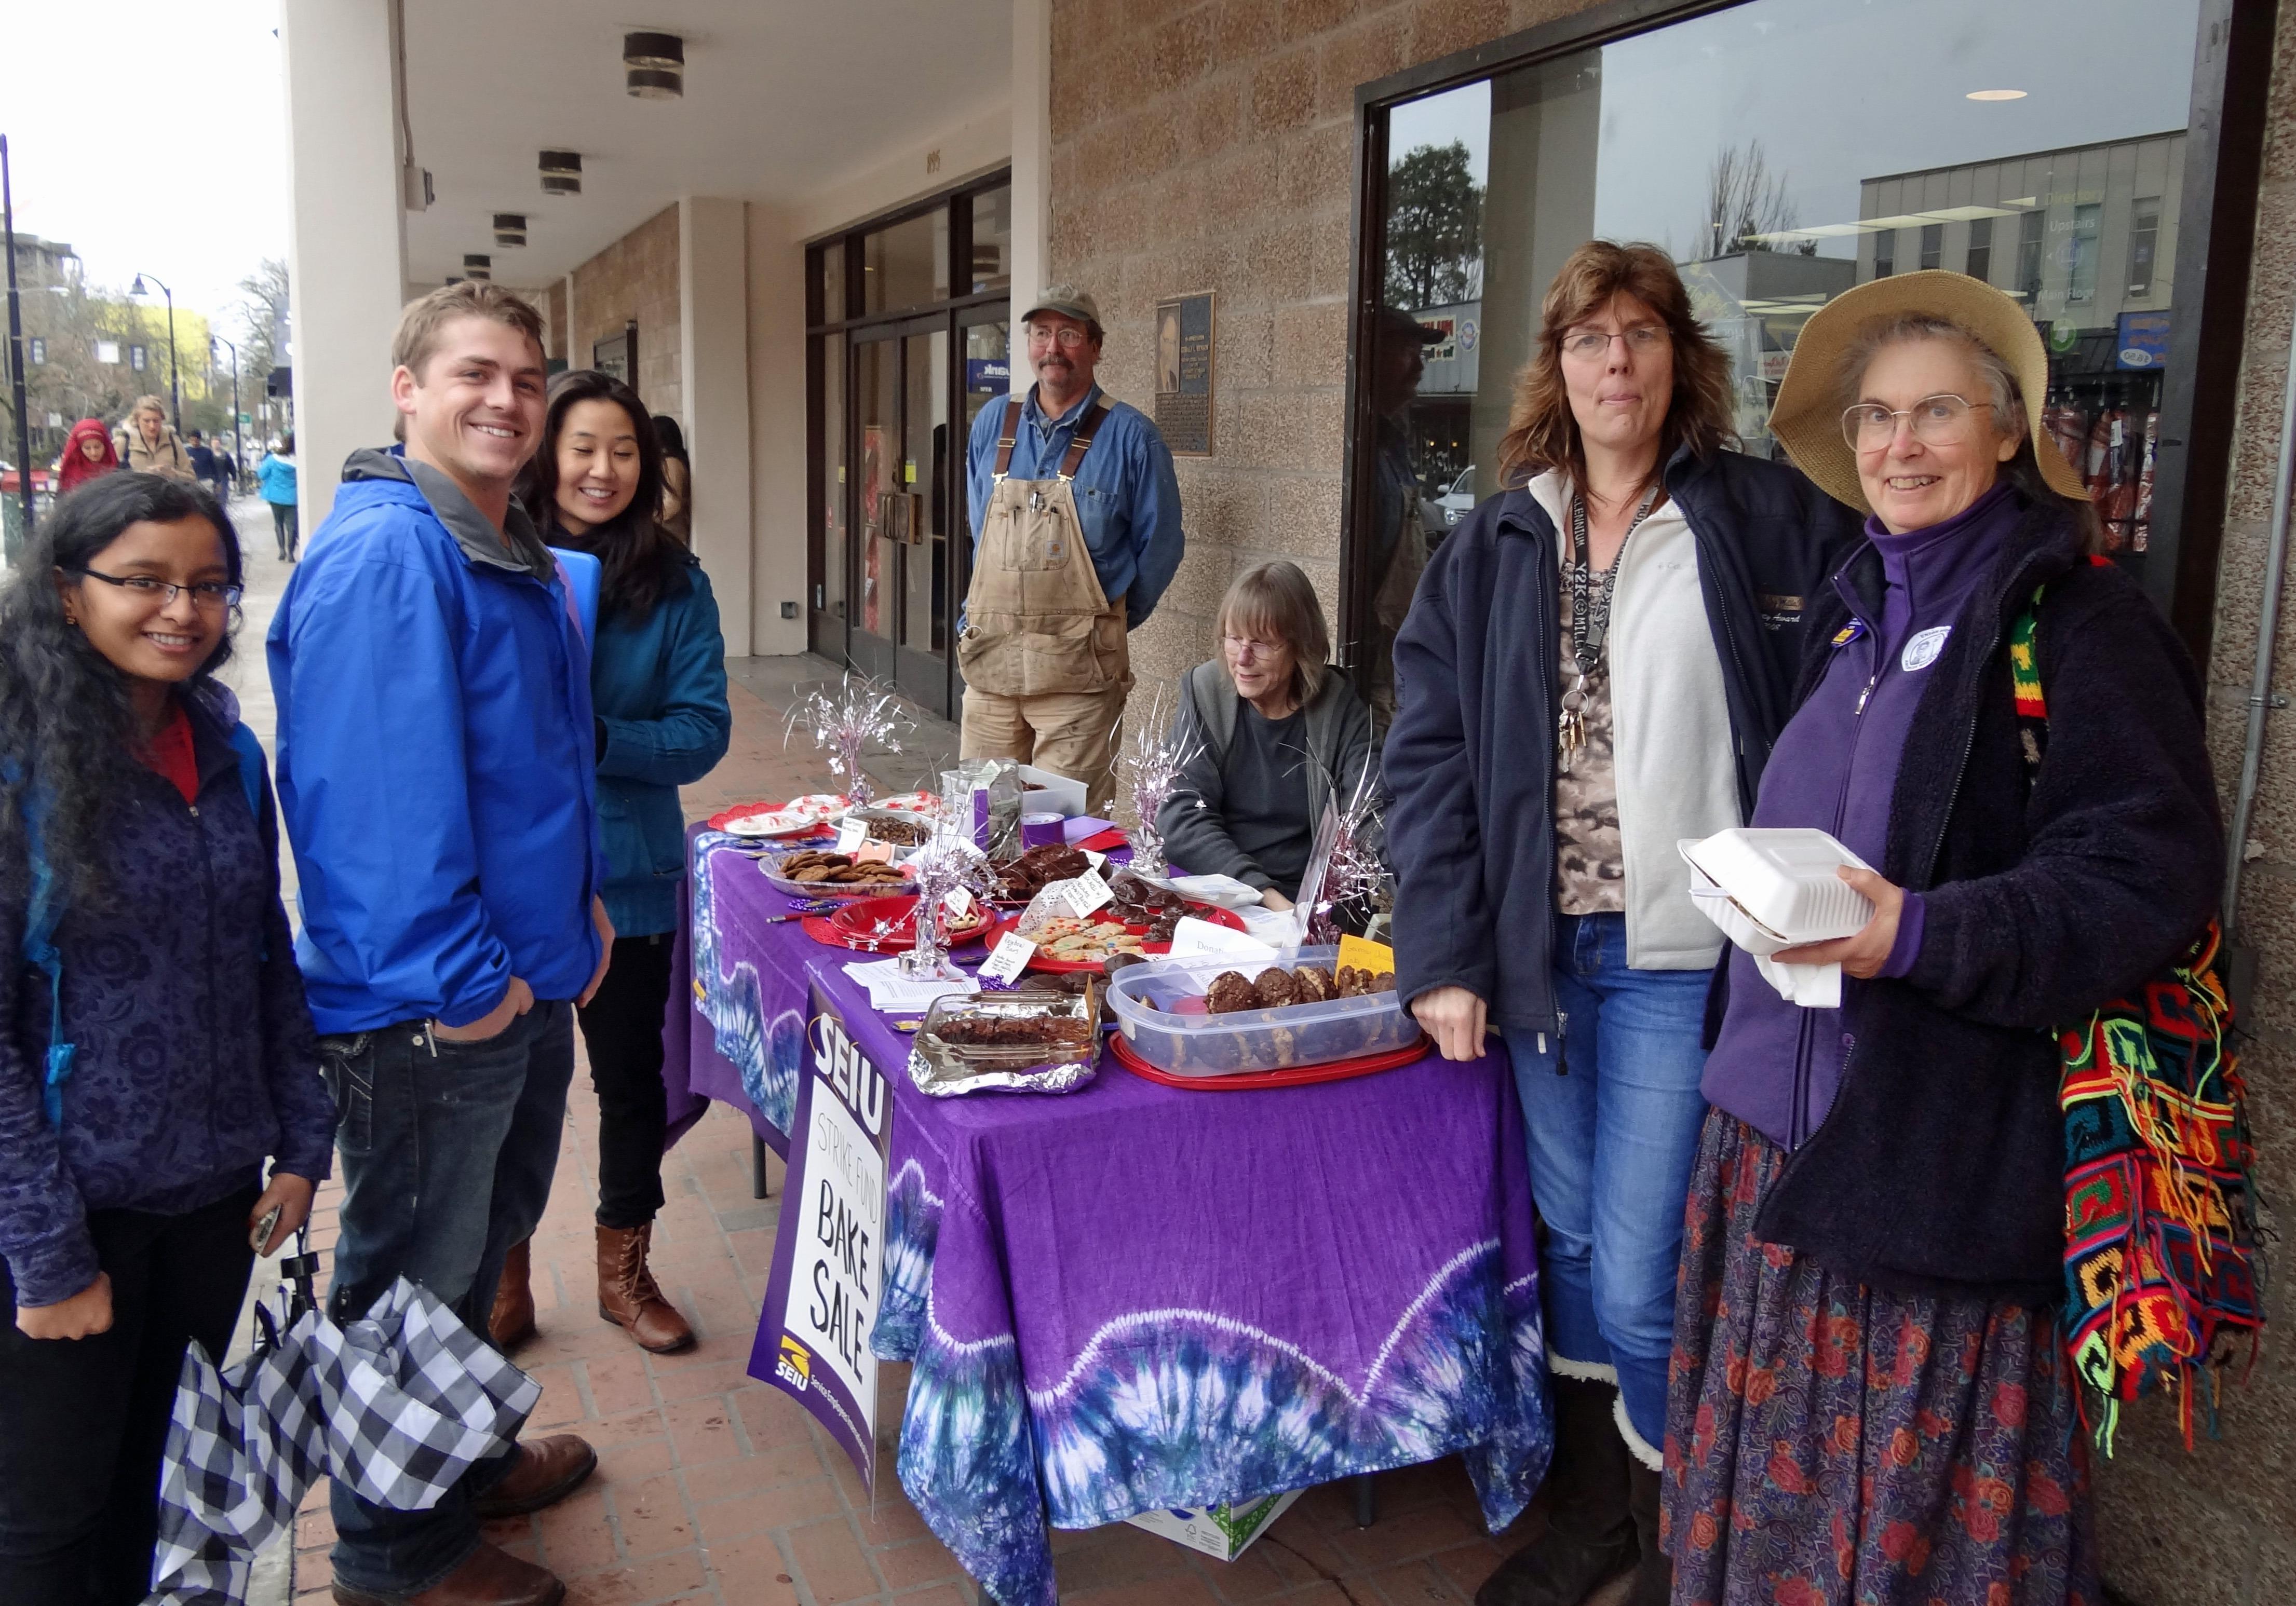 Student customers, Craig Koharchick, Linda Sappington, Beth Singler, and Dorothy Attneave.